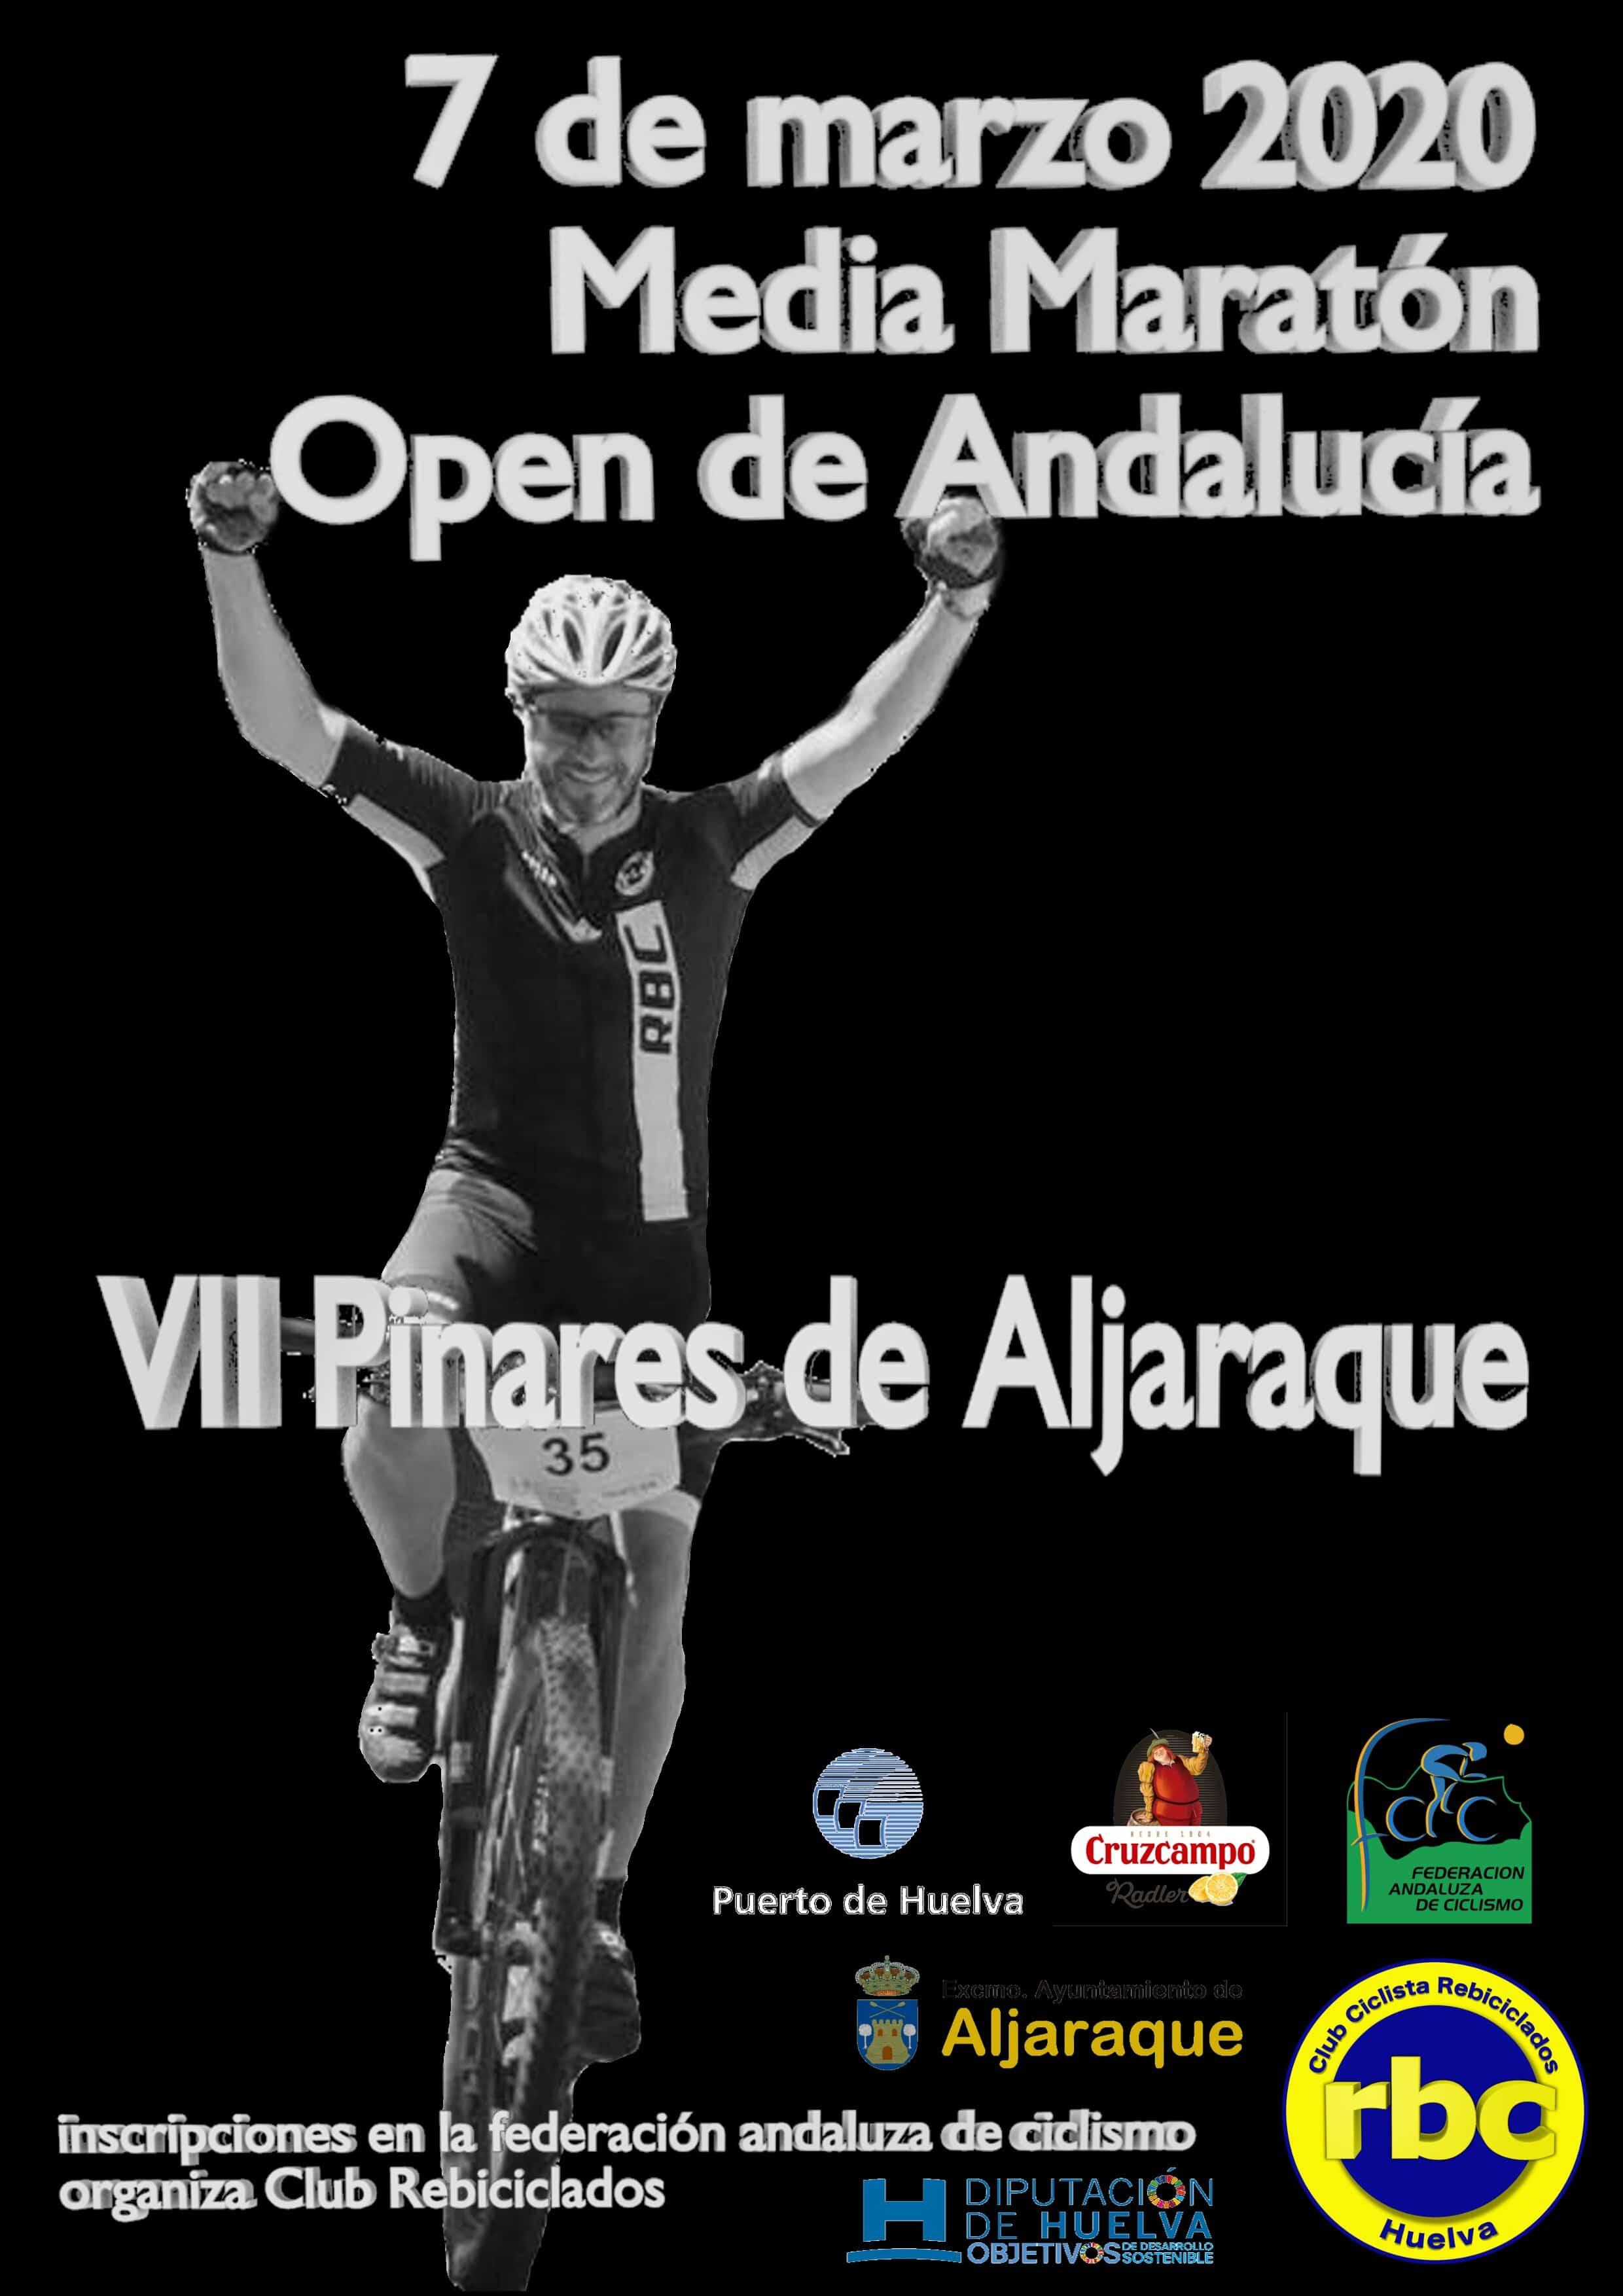 Aljaraque se prepara para abrir el Open Andalucía BTT Media Maratón 2020